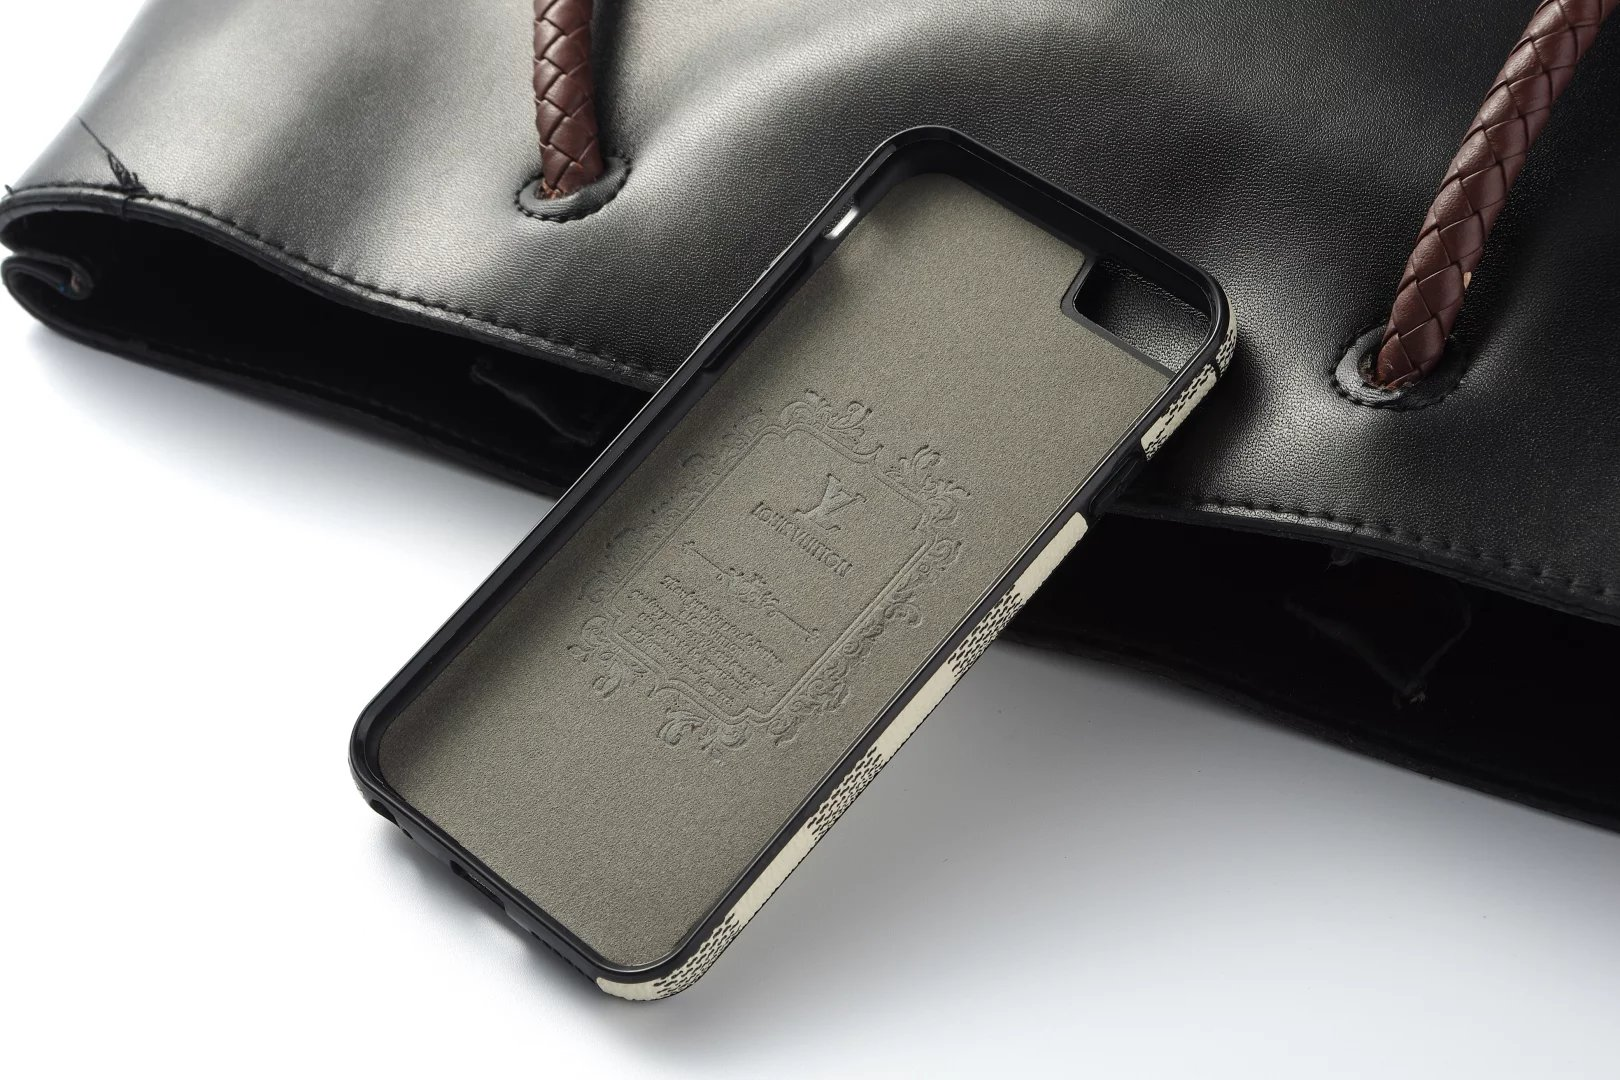 eigene iphone hülle iphone schutzhülle selbst gestalten Louis Vuitton iphone6 hülle iphone 6 filzhülle ipad mini hülle 6lbst gestalten hülle erstellen ca6 6lbst gestalten apple iphone ca6 hülle iphone 6